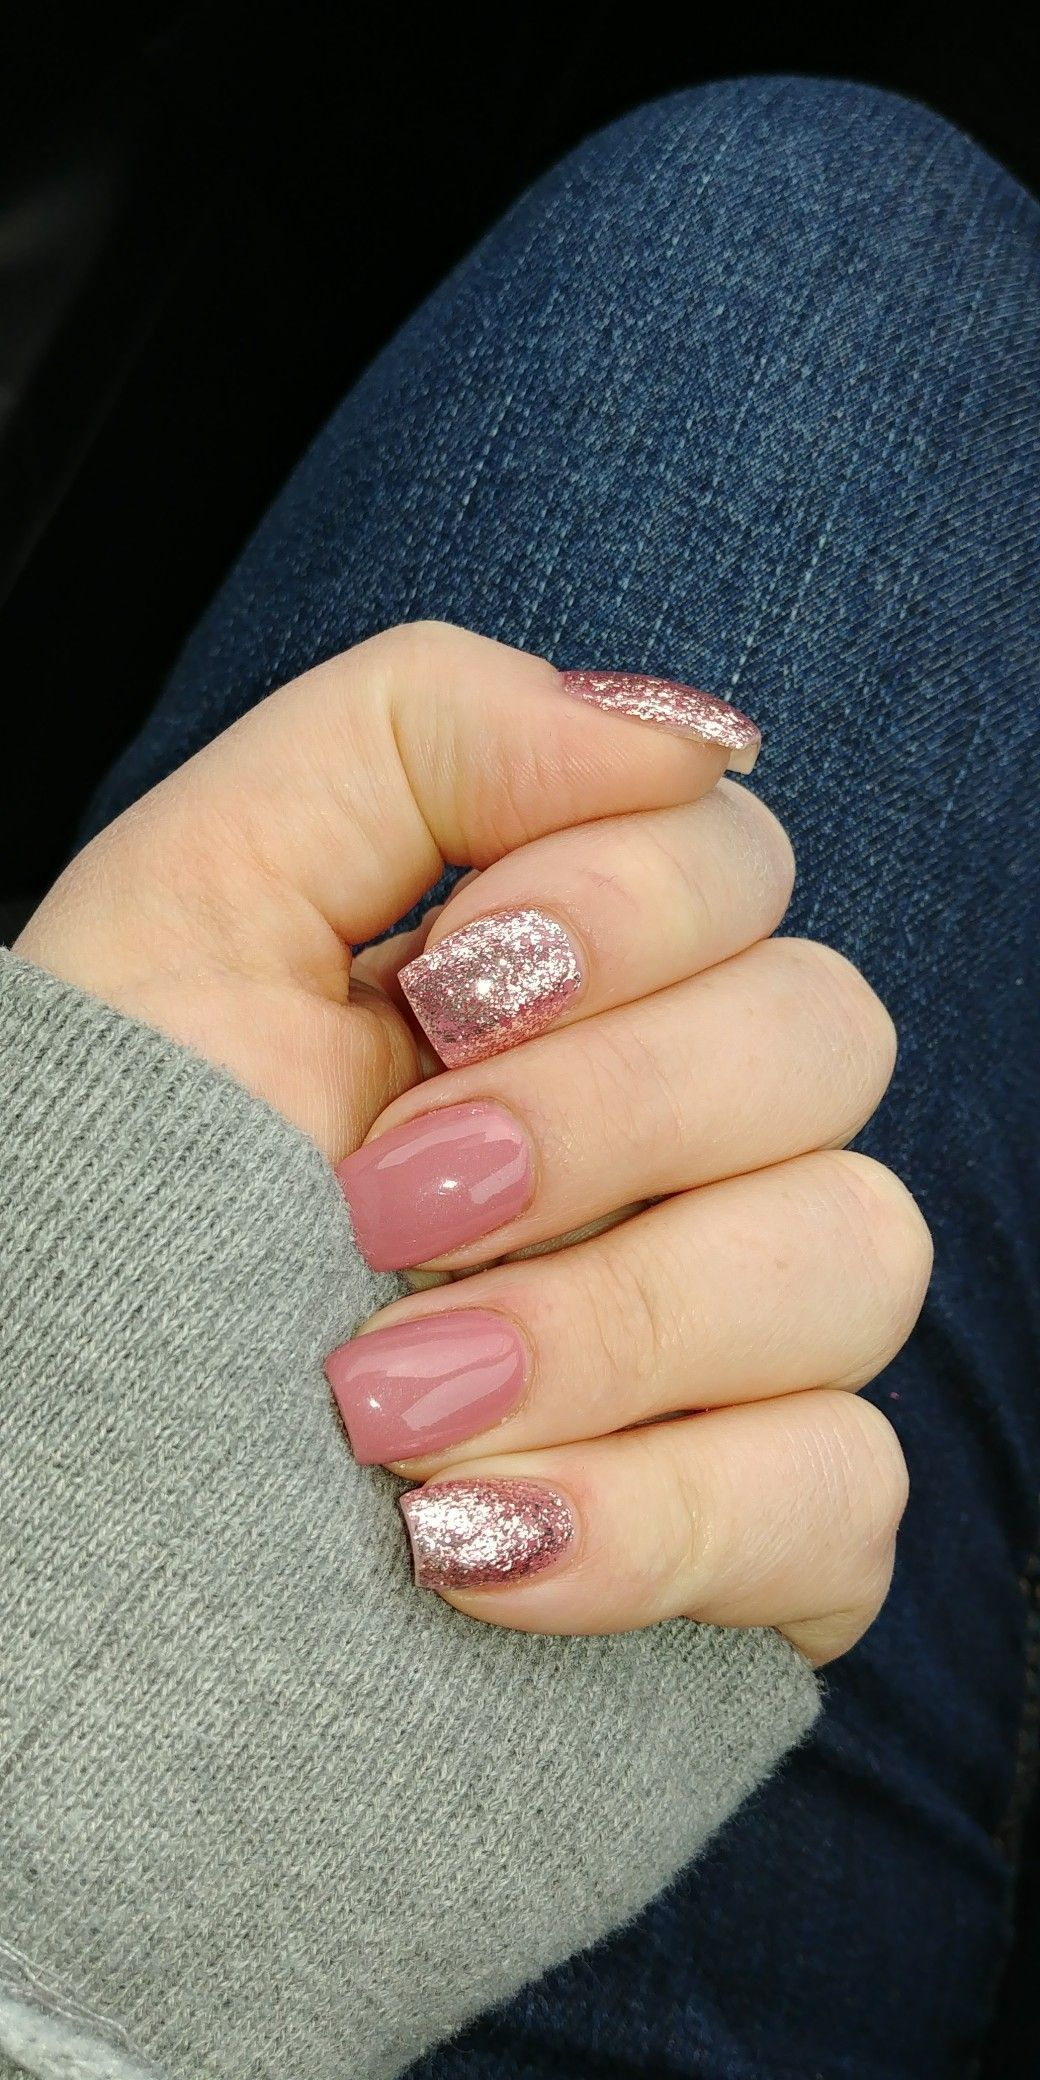 Acrylic Nails Pink Sparkle Short Acrylicnails Glitternails Nail Designs Pink Nails Simple Nails